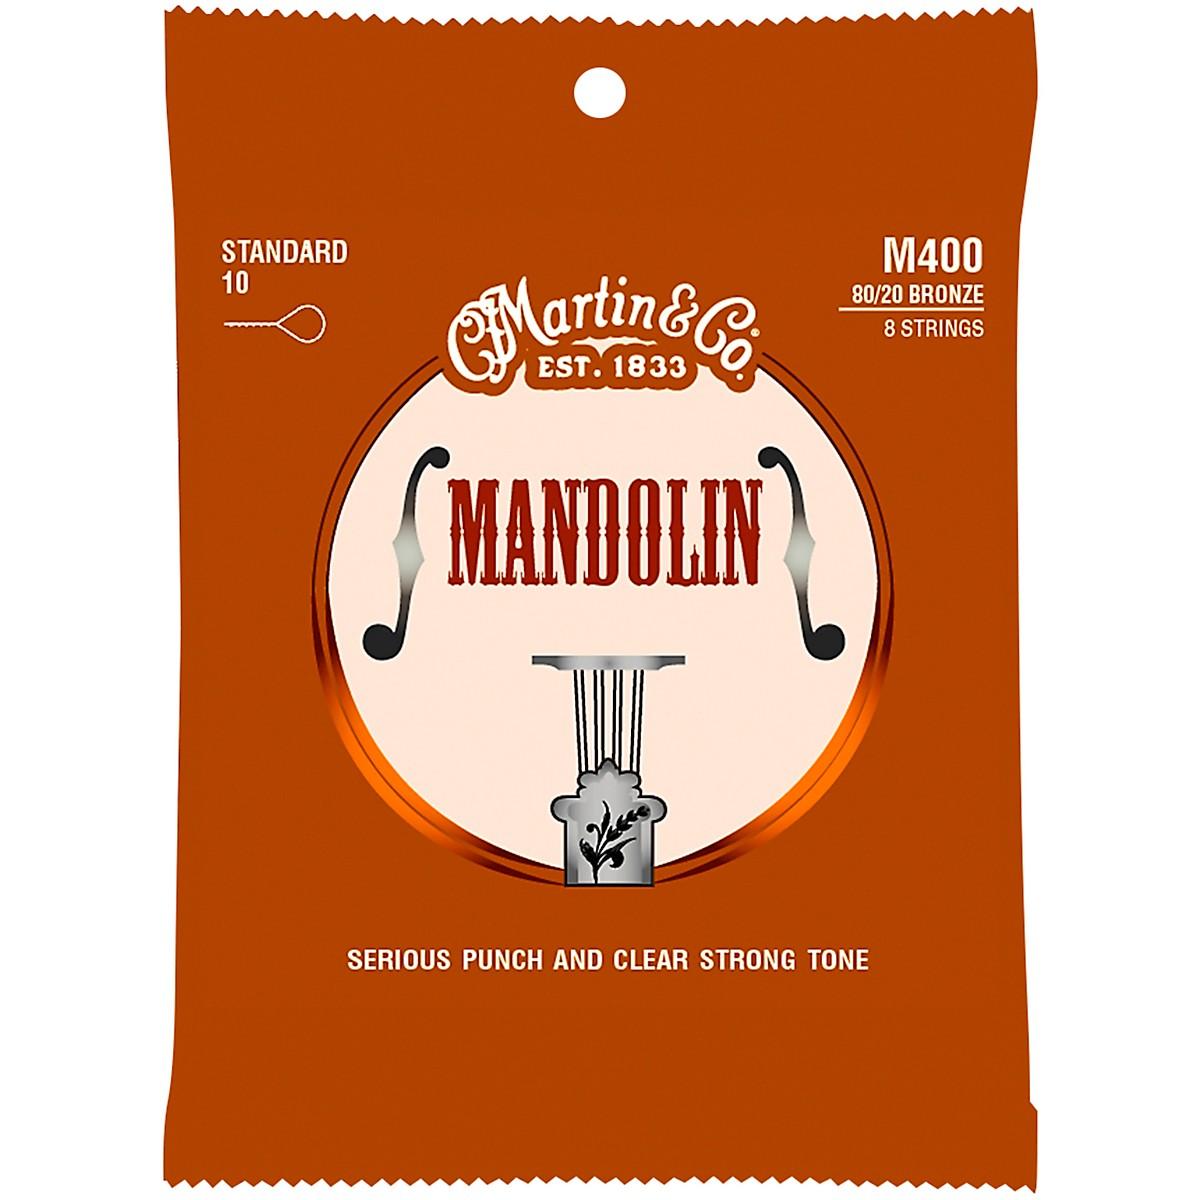 Martin Mandolin M400 80/20 Bronze 8 Strings Standard 10